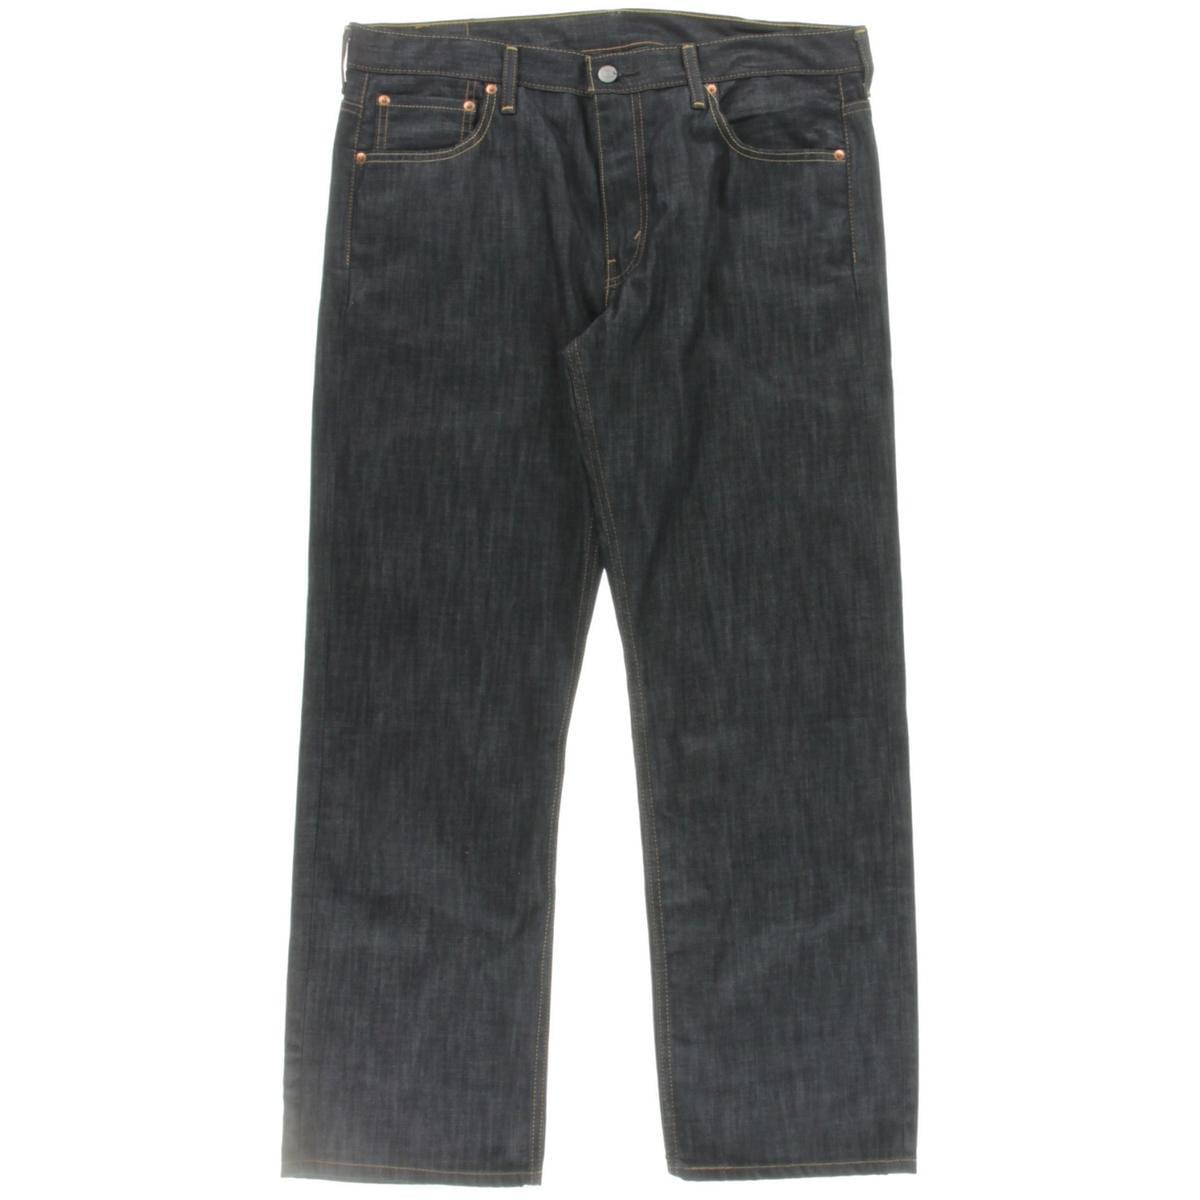 Levi's Mens 569 Loose Fit Indigo Wash Straight Leg Jeans